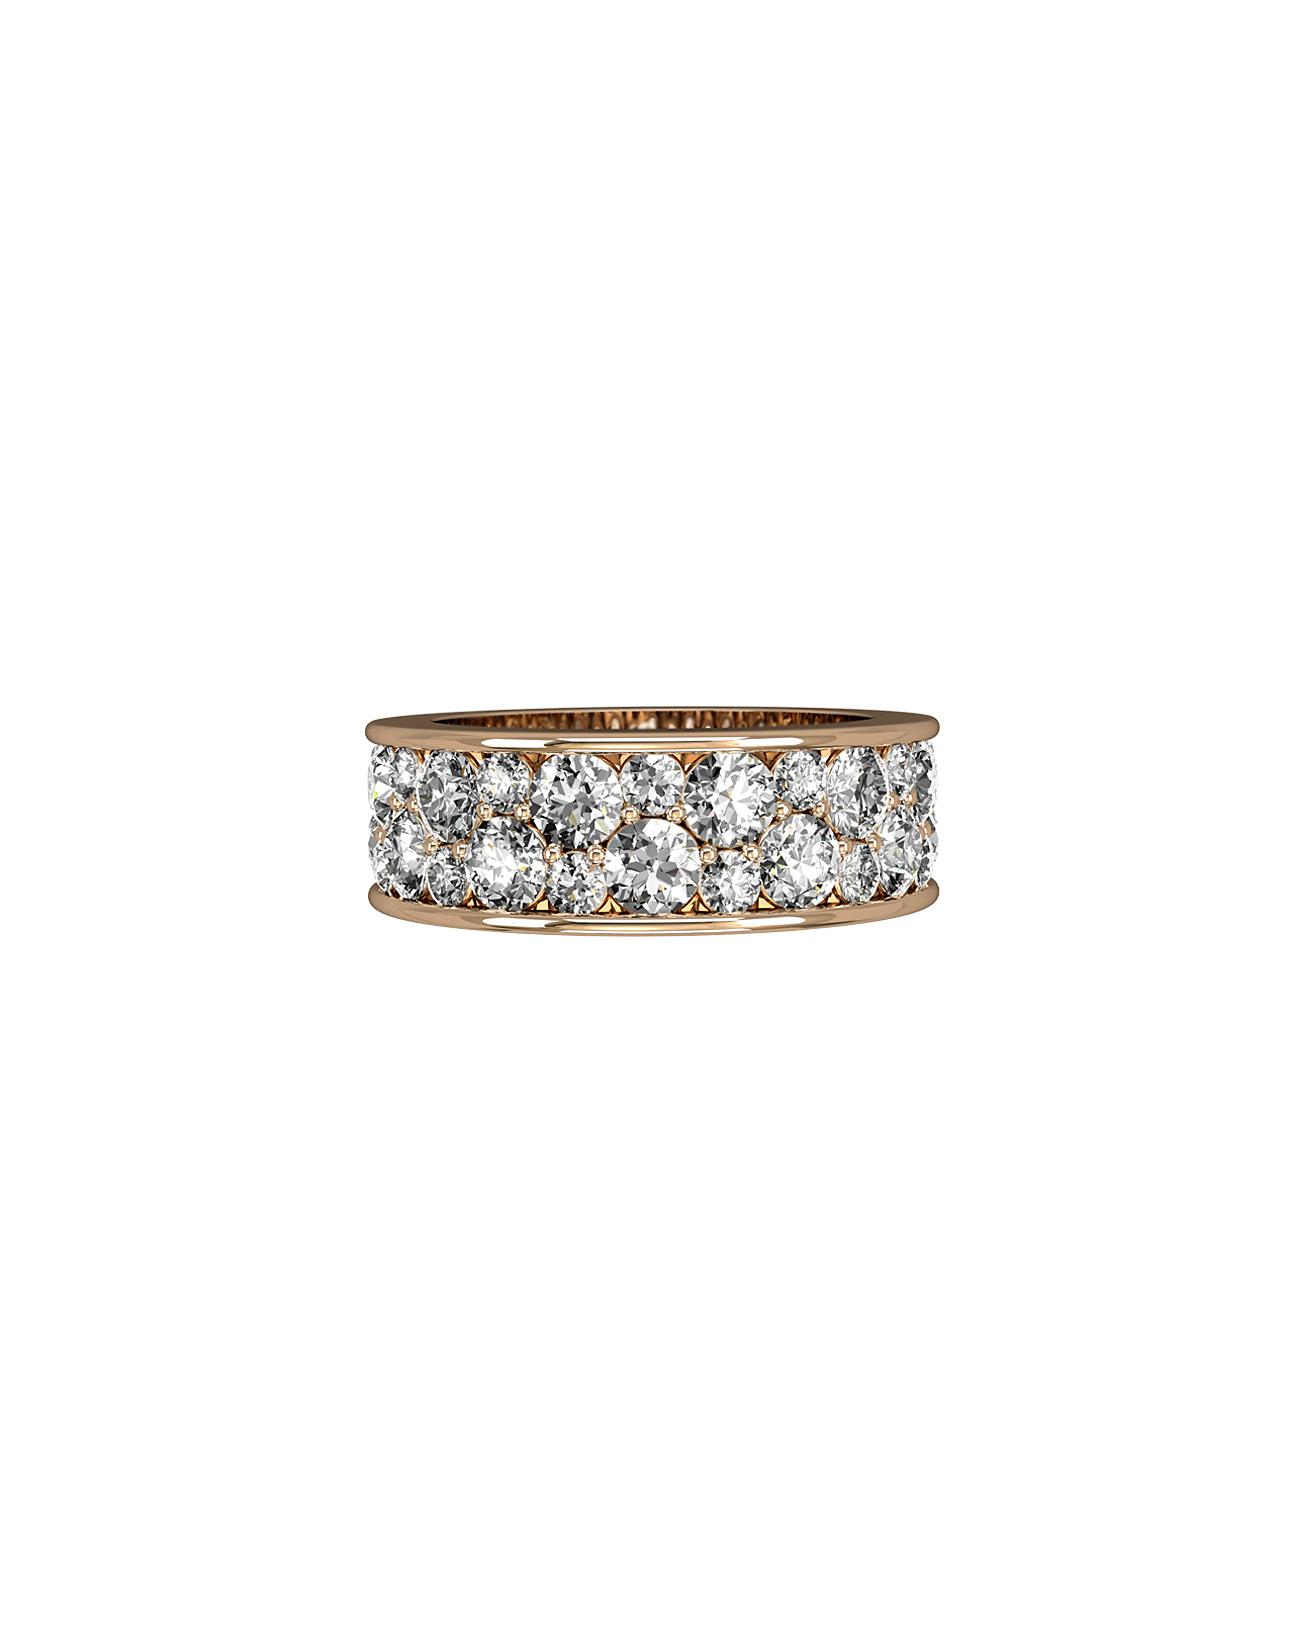 designer diamond bridal jewelry-1-7.jpg